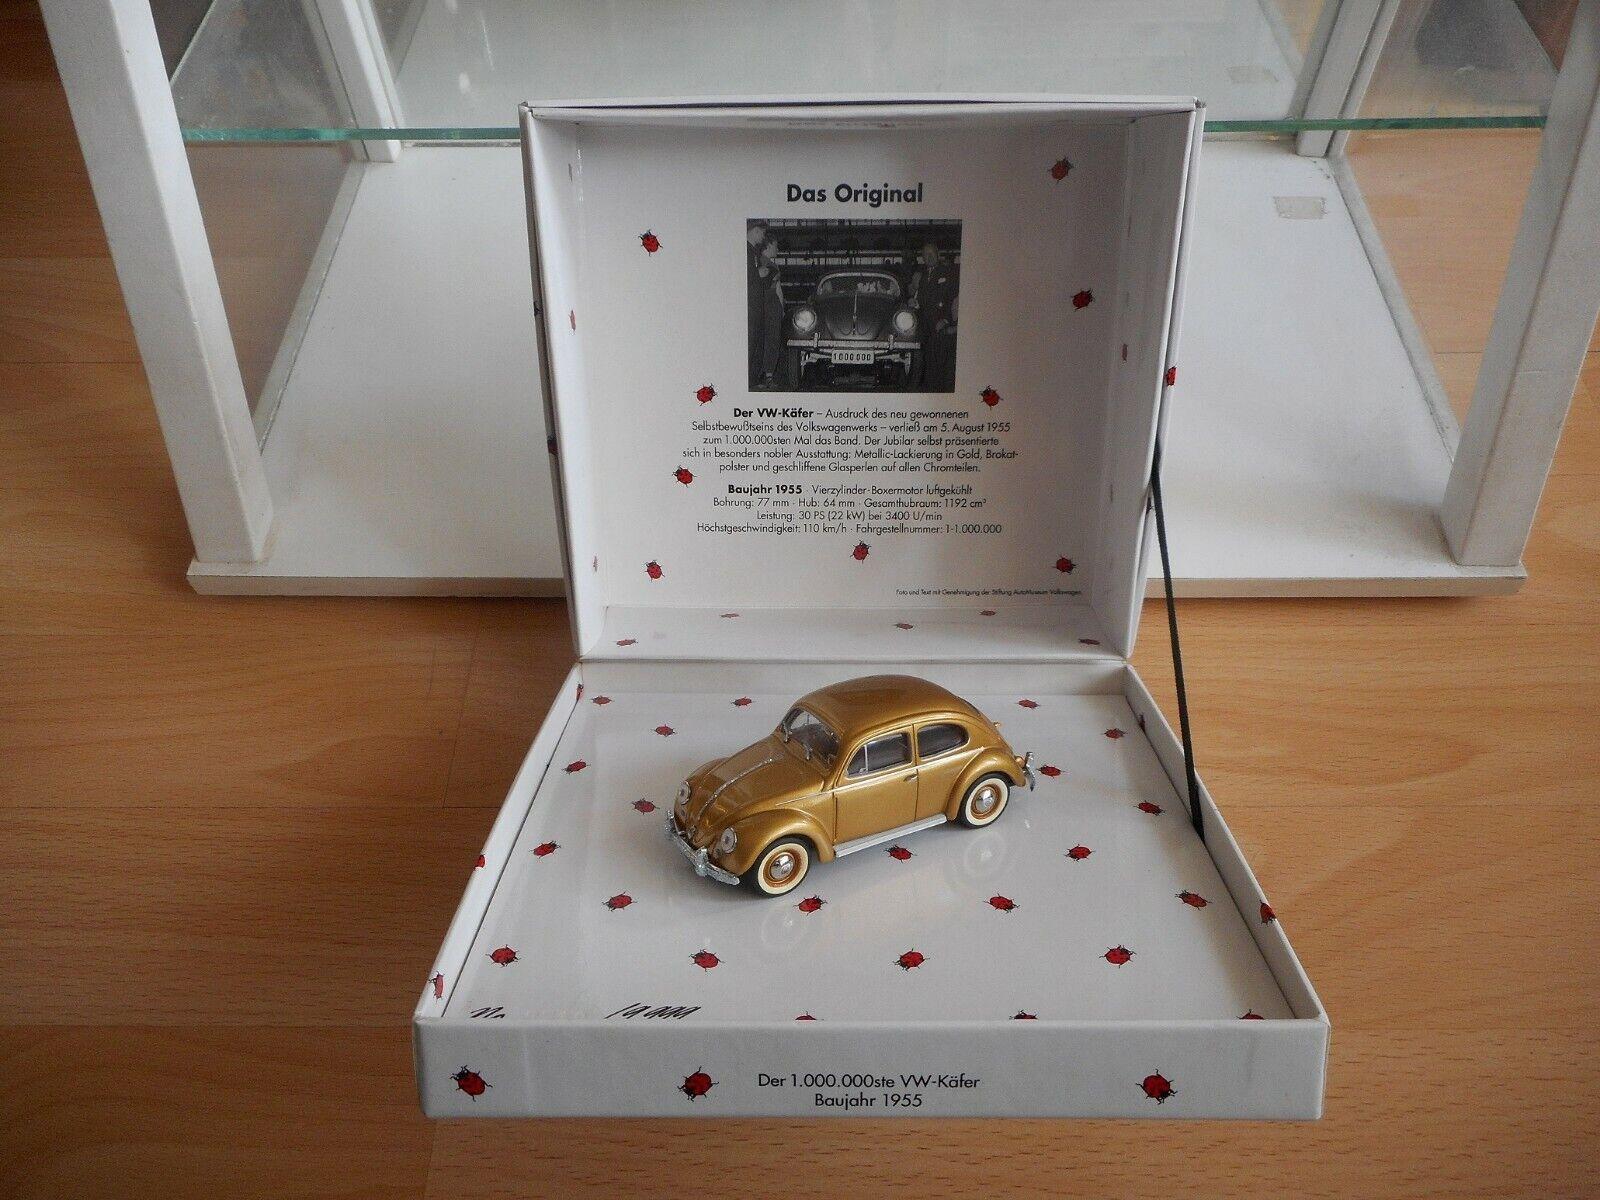 Minichamps VW Volkswagen Beetle  Der Millionste Kafer Kafer Kafer  in gold on 1 43 in Box c09839